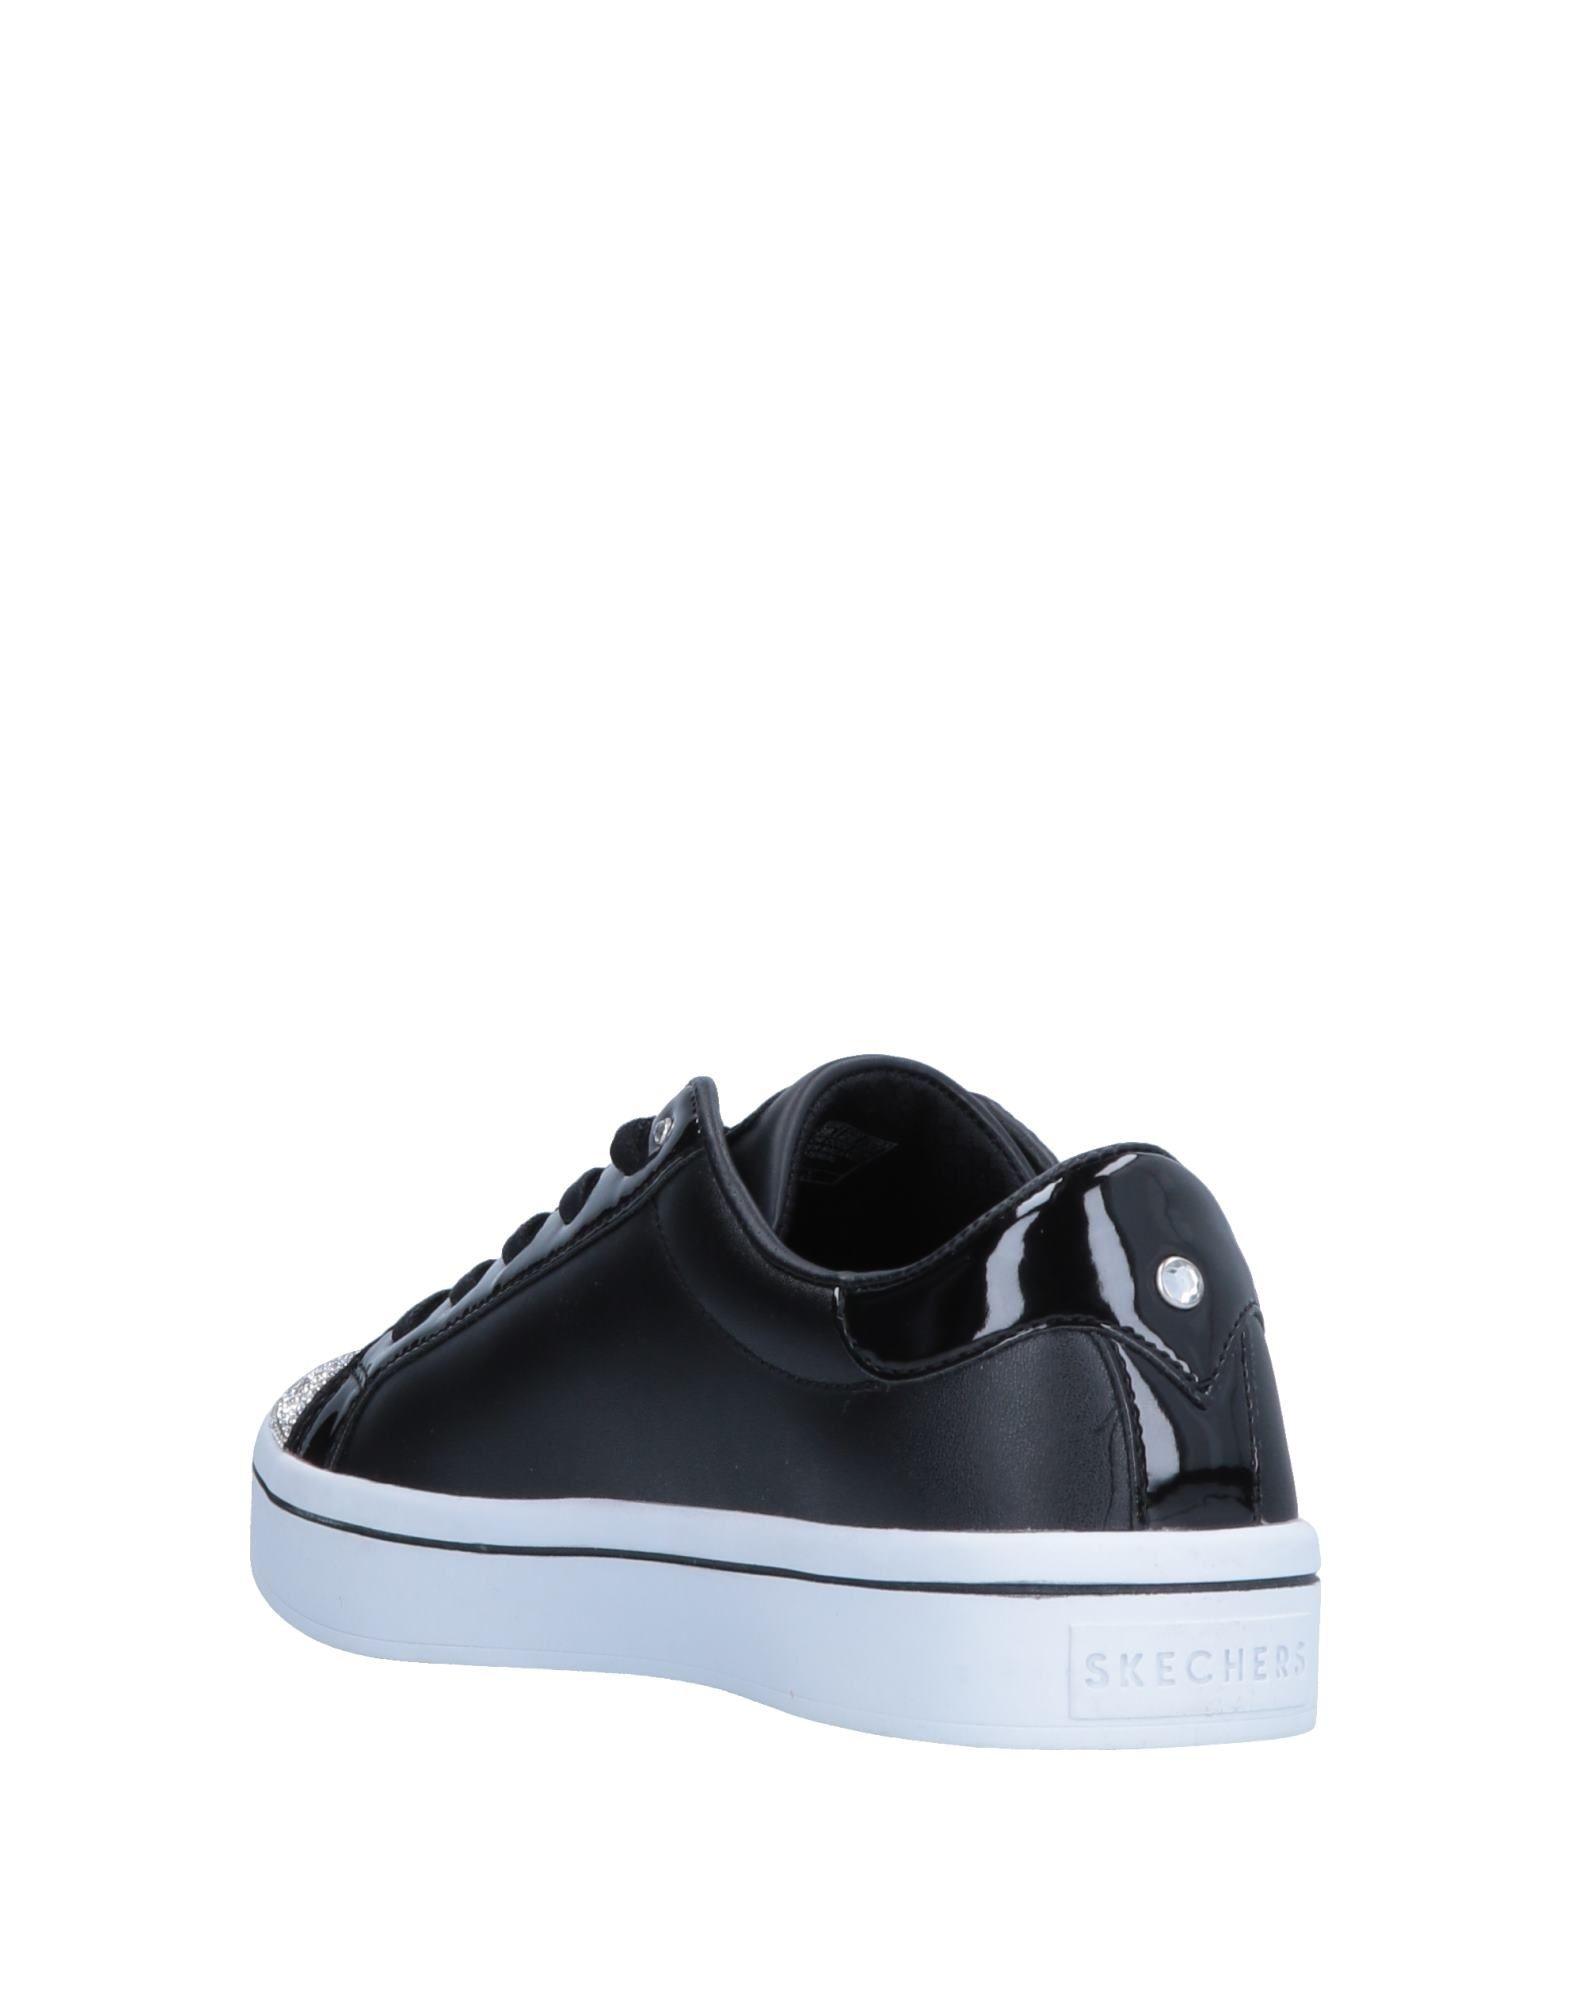 Skechers Sneakers Damen  beliebte 11557466TU Gute Qualität beliebte  Schuhe b929de